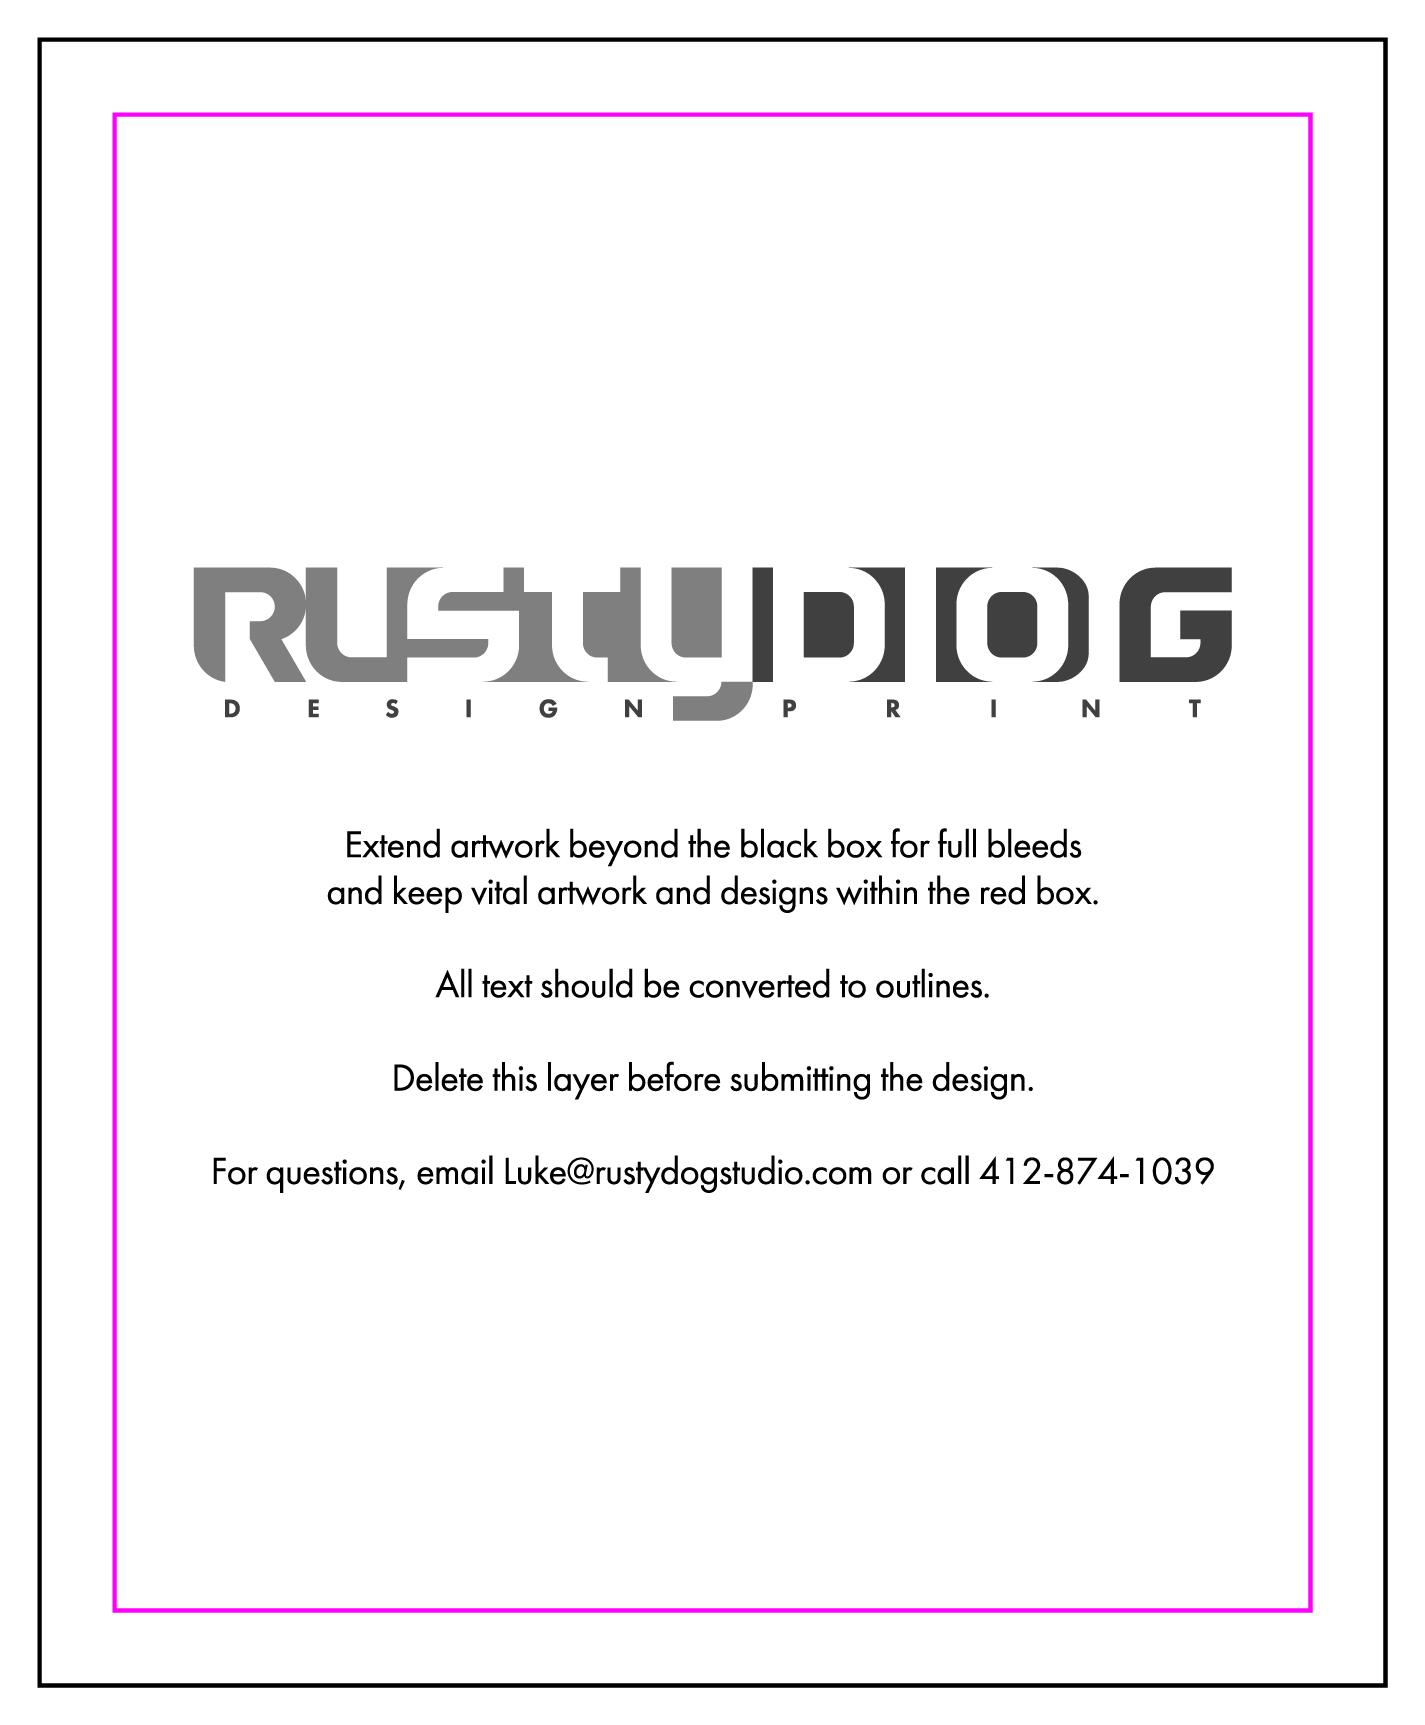 Templates for custom printed marketing materials in pittsburgh 425x55 vertical pdf jpeg spiritdancerdesigns Choice Image